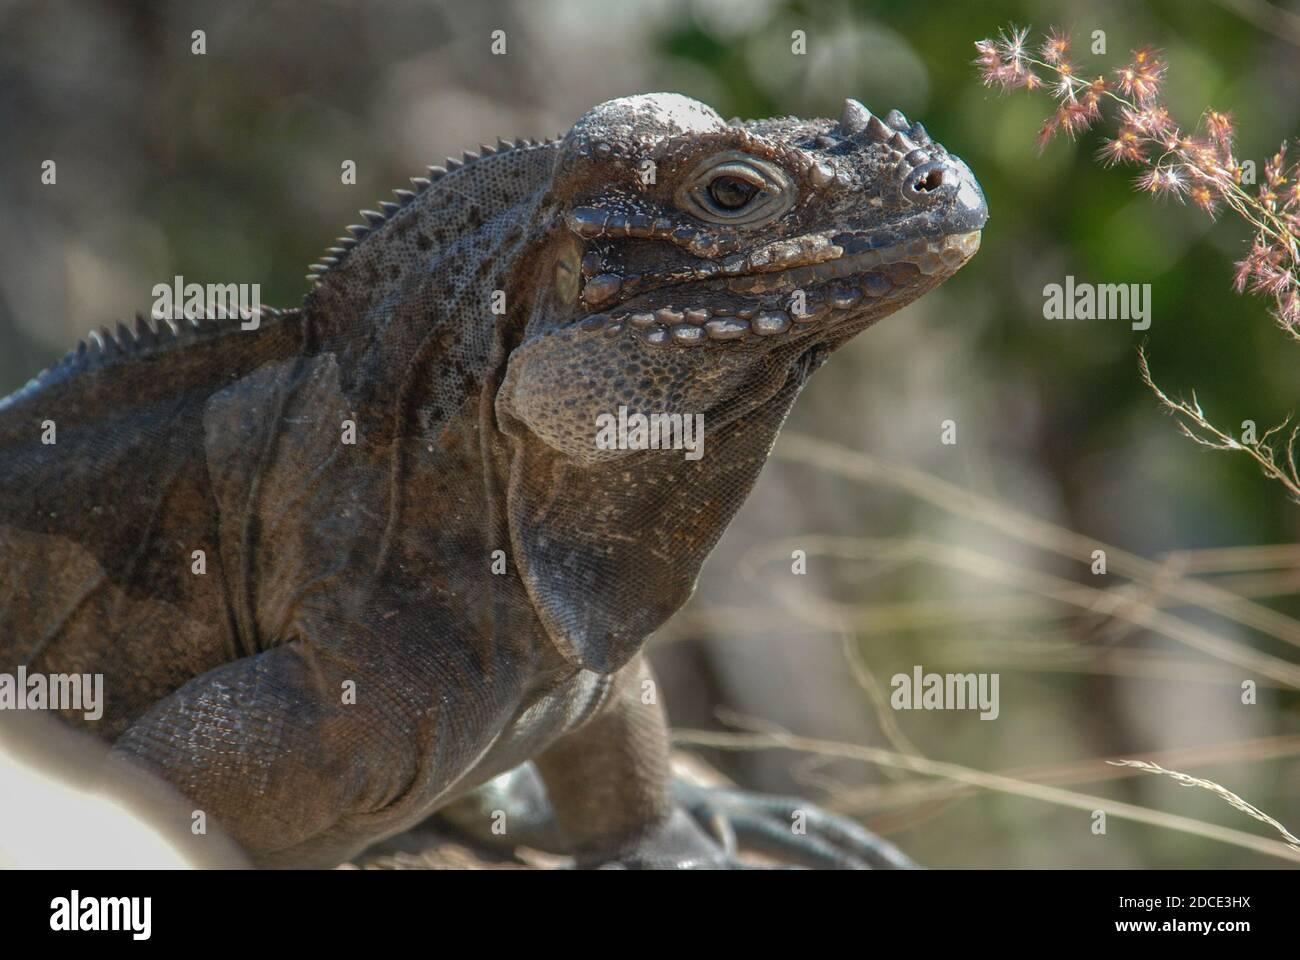 A rhinoceros iguana (Cyclura cornuta) a threatened rock iguana species endemic to Hispaniola. Stock Photo